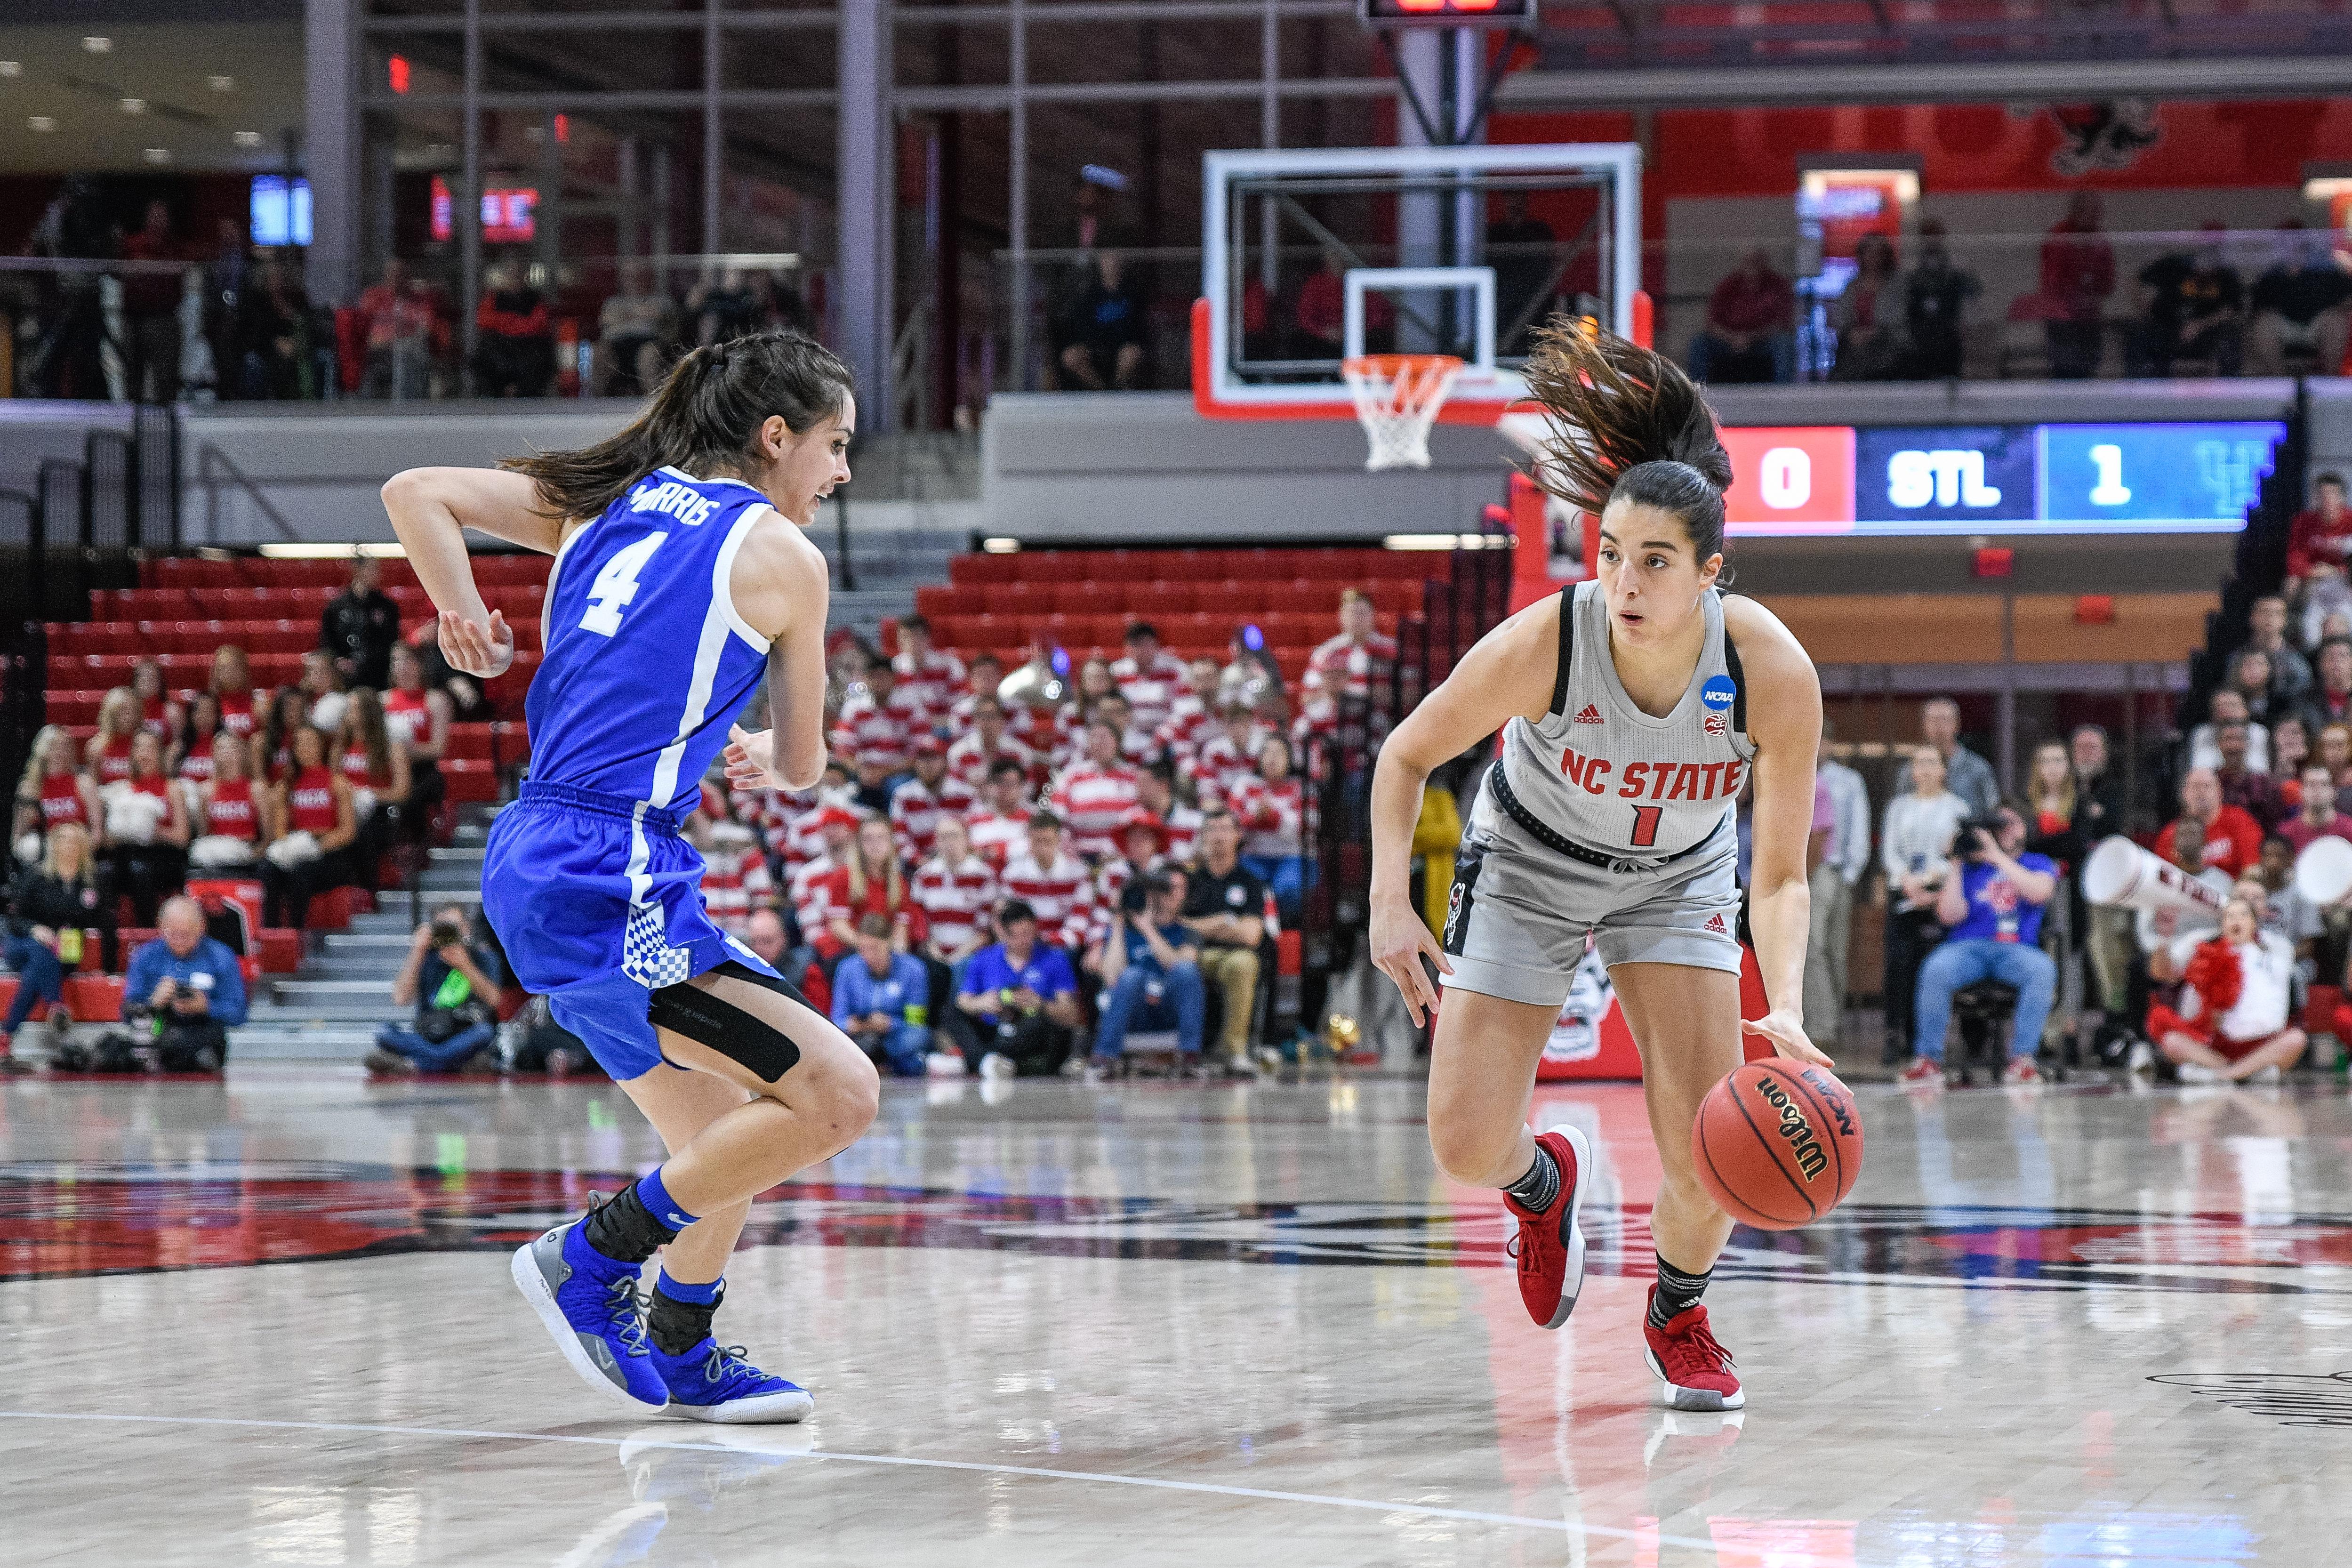 NCAA BASKETBALL: MAR 25 Div I Women's Championship - Second Round - Kentucky v NC State